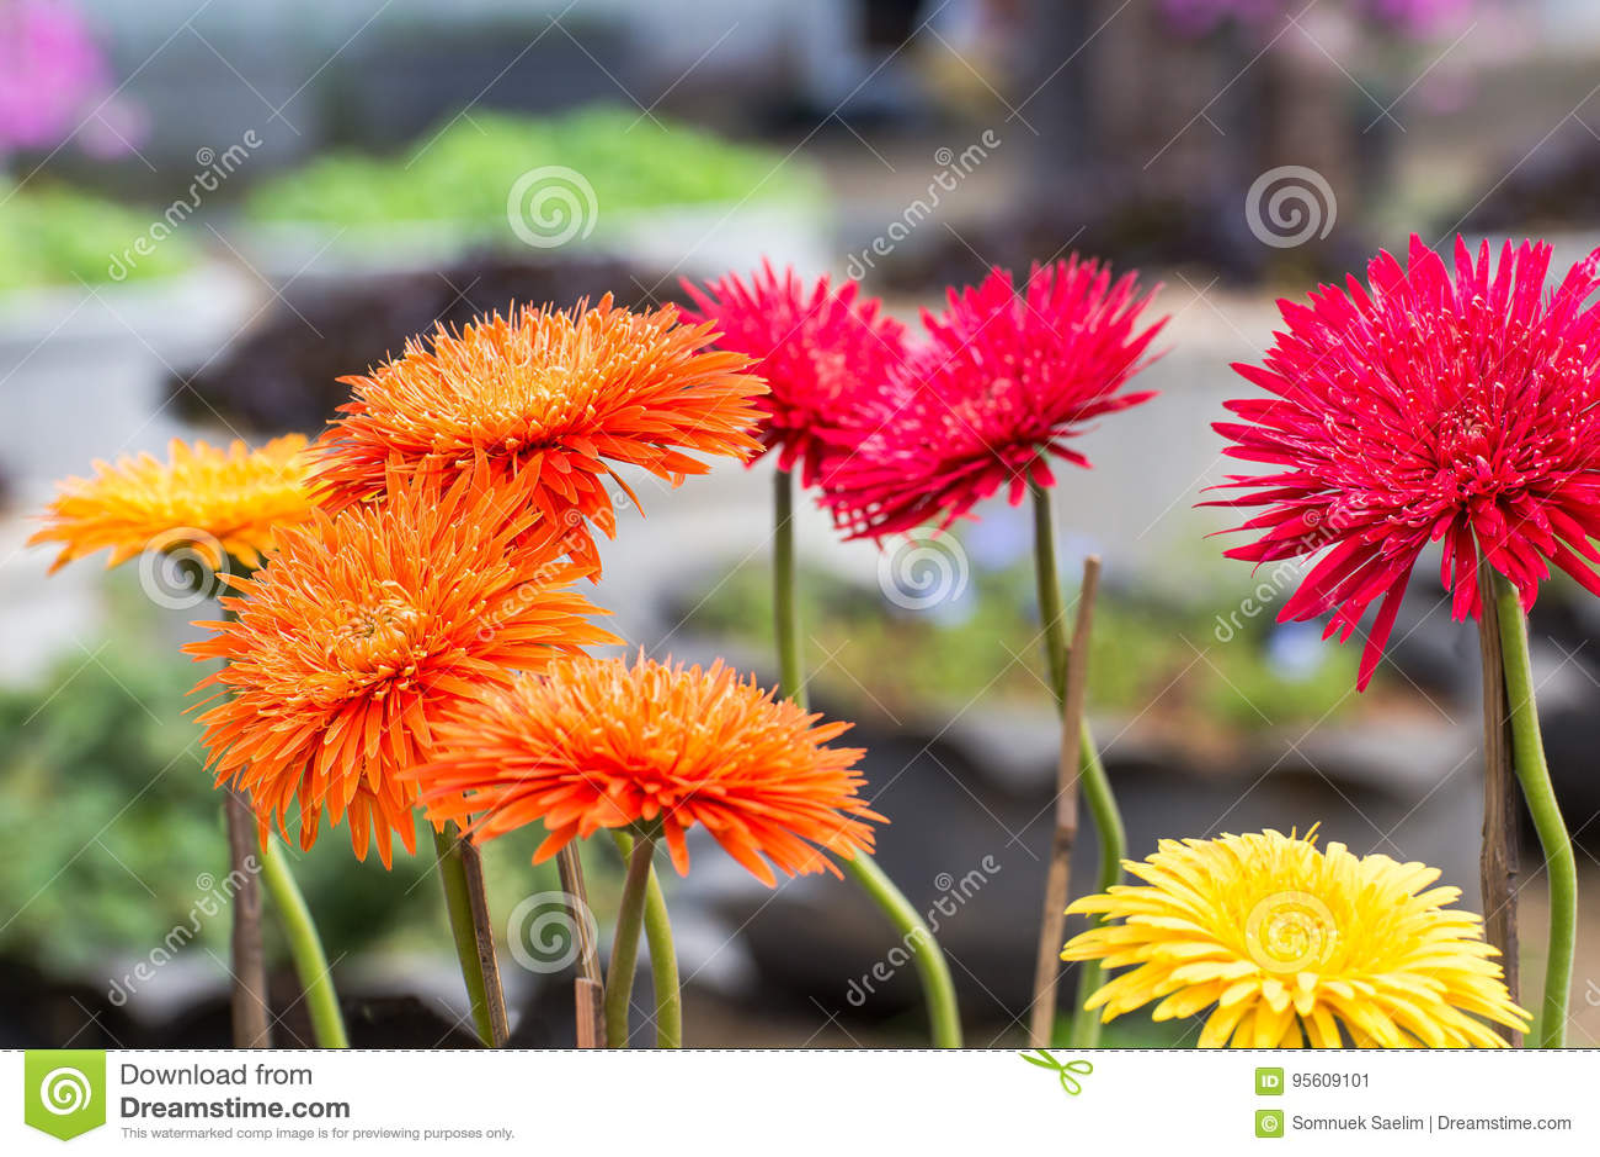 Beauty color chrysanthemum flowers close updaisy flower stock image beauty color chrysanthemum flowers close updaisy flower izmirmasajfo